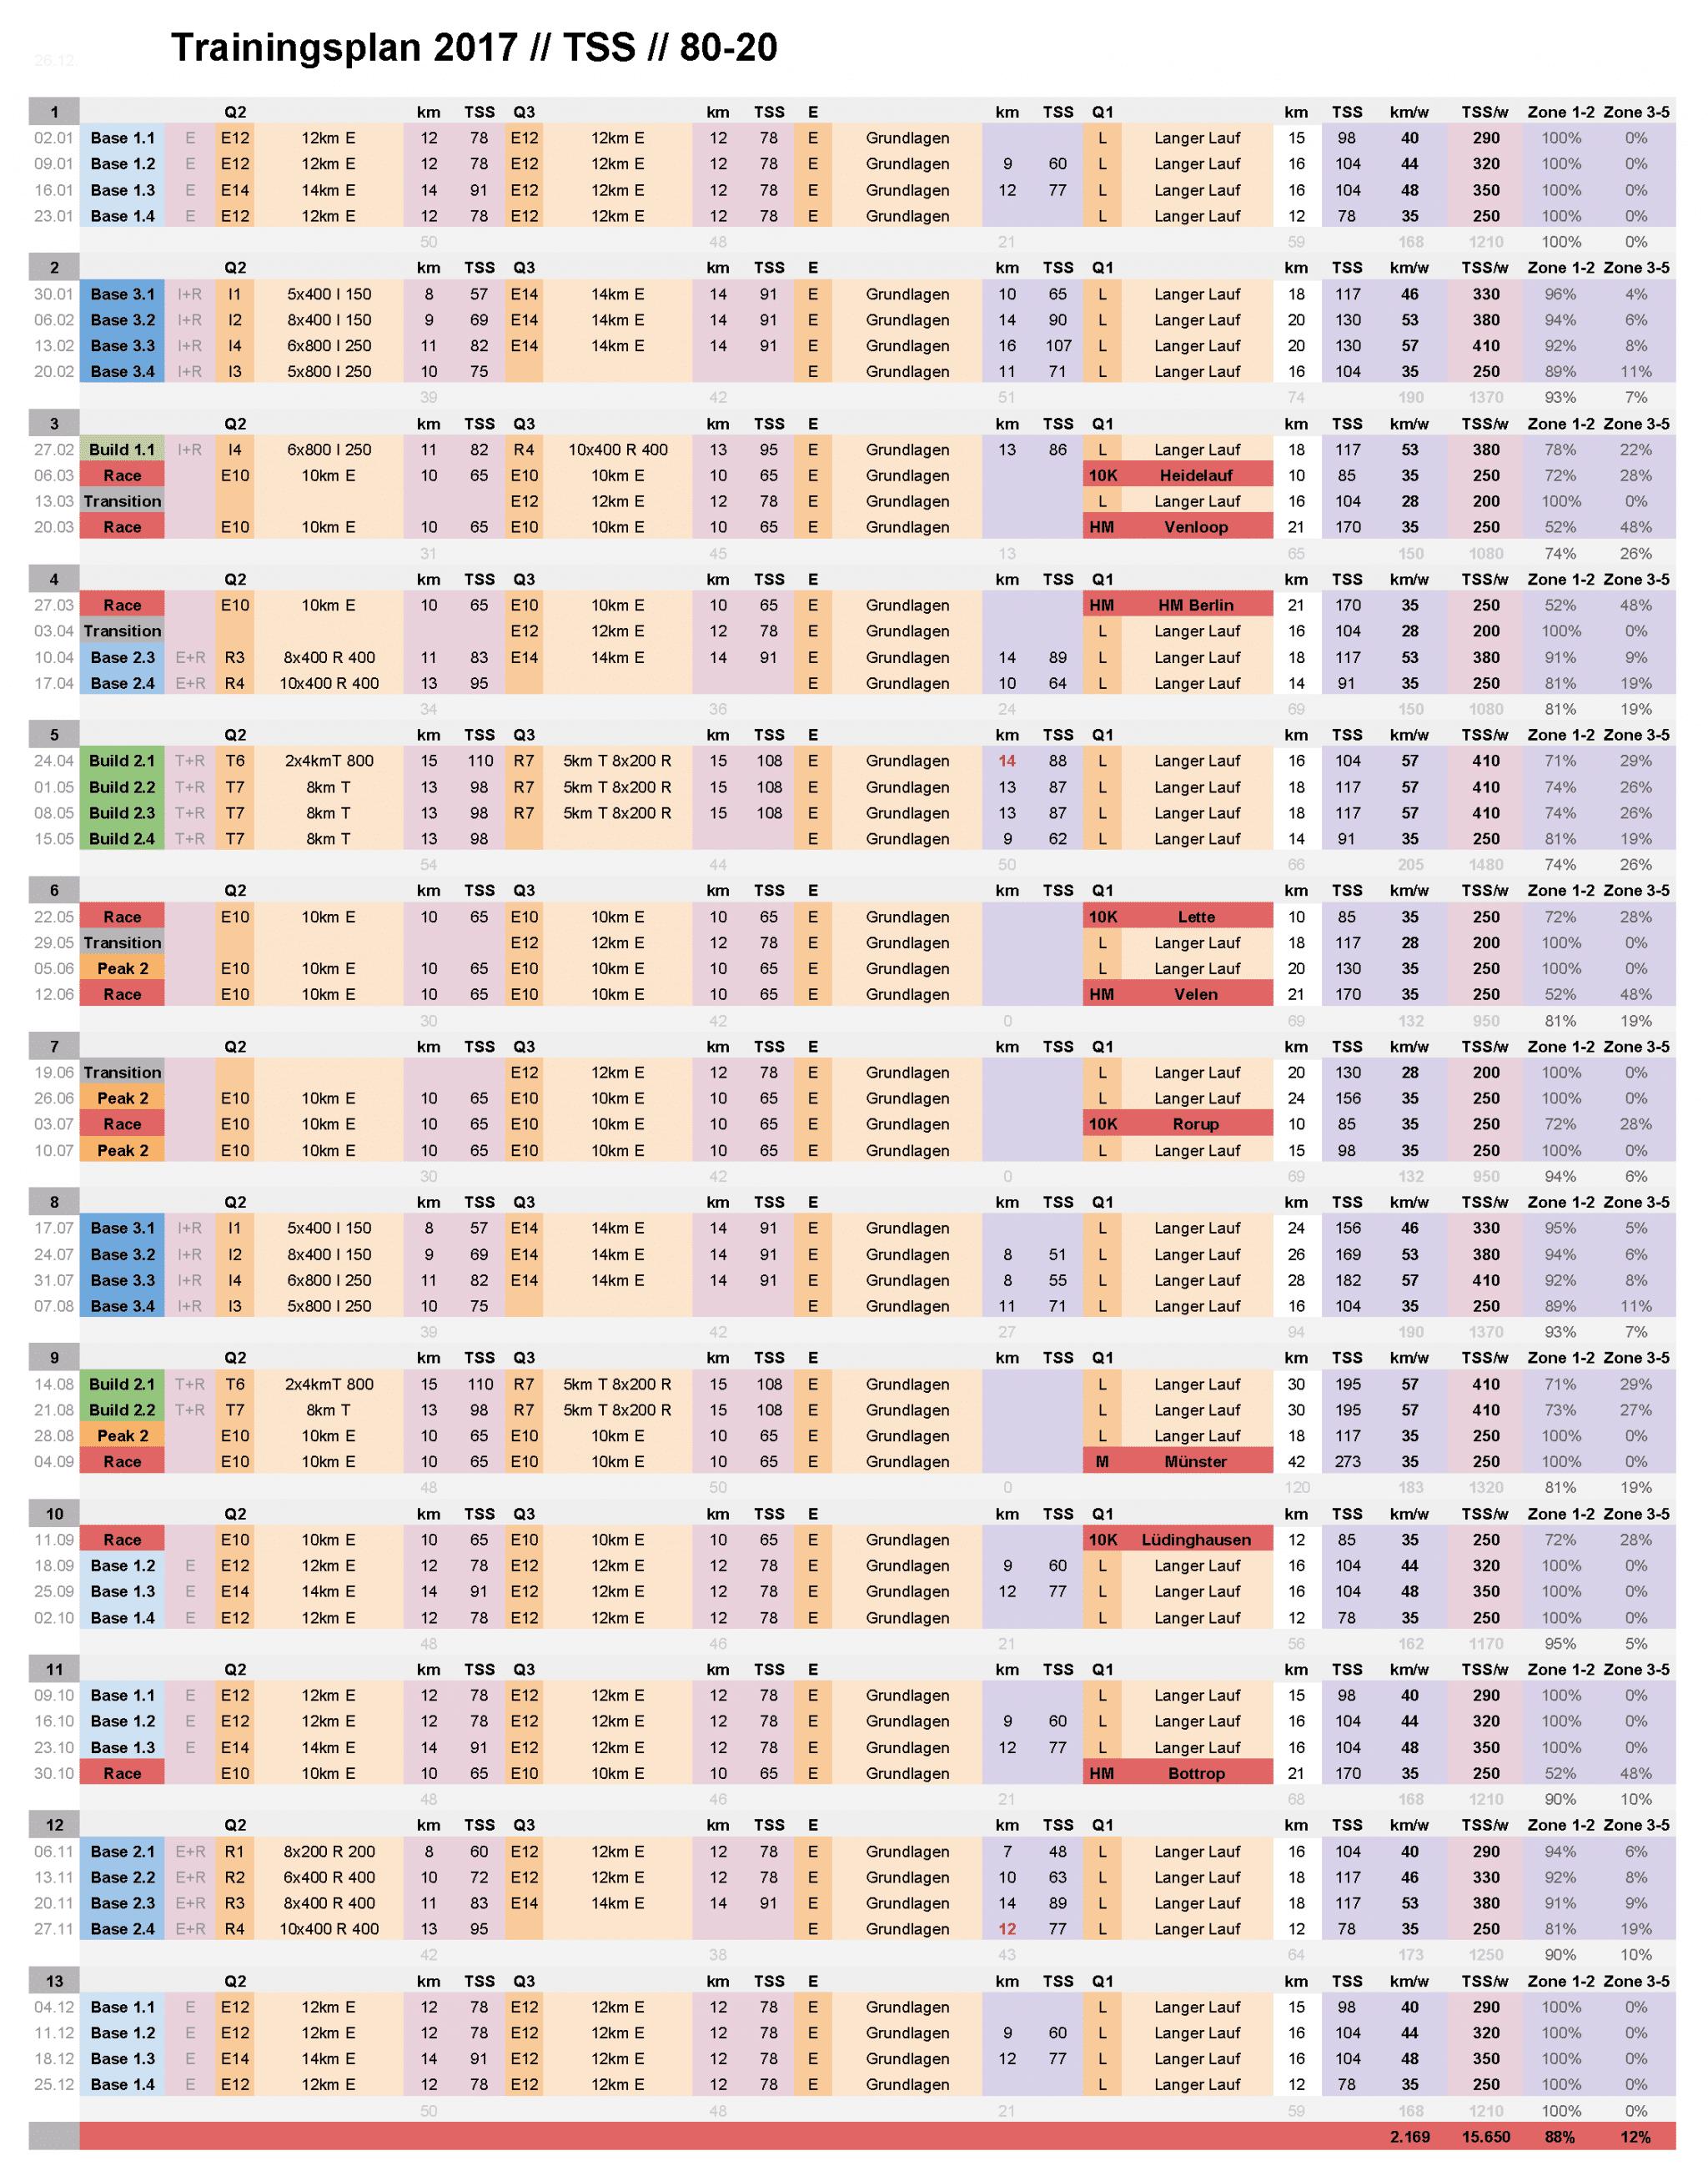 Trainingsplan 2017